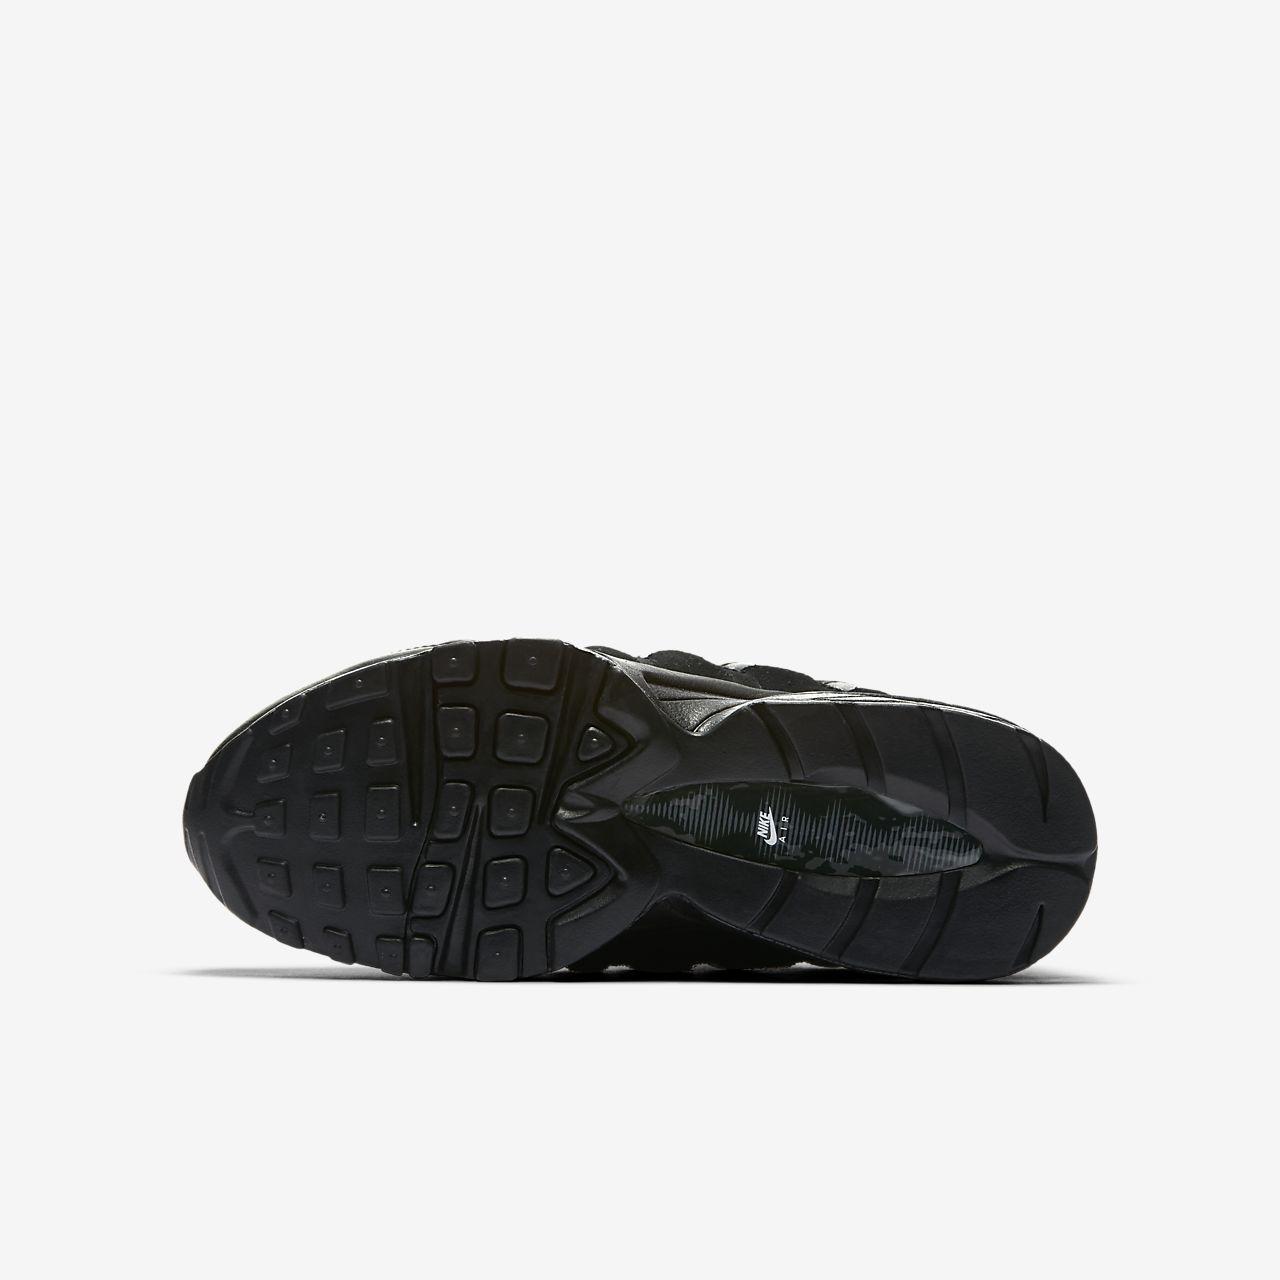 Details about Nike Air Max 95 Big Kid's Shoes Black Black 307565 055